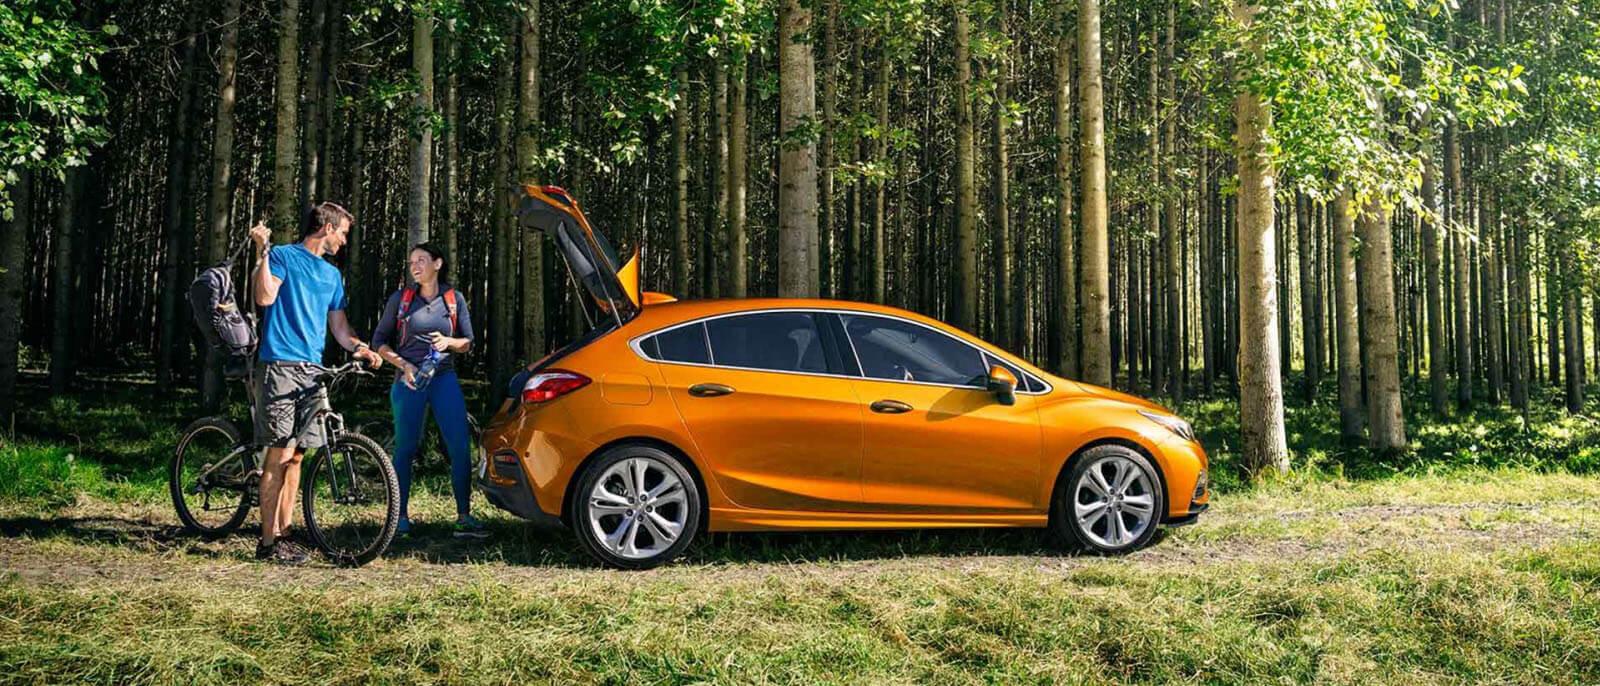 2017-Chevrolet-Cruze-Hatchback-outdoors